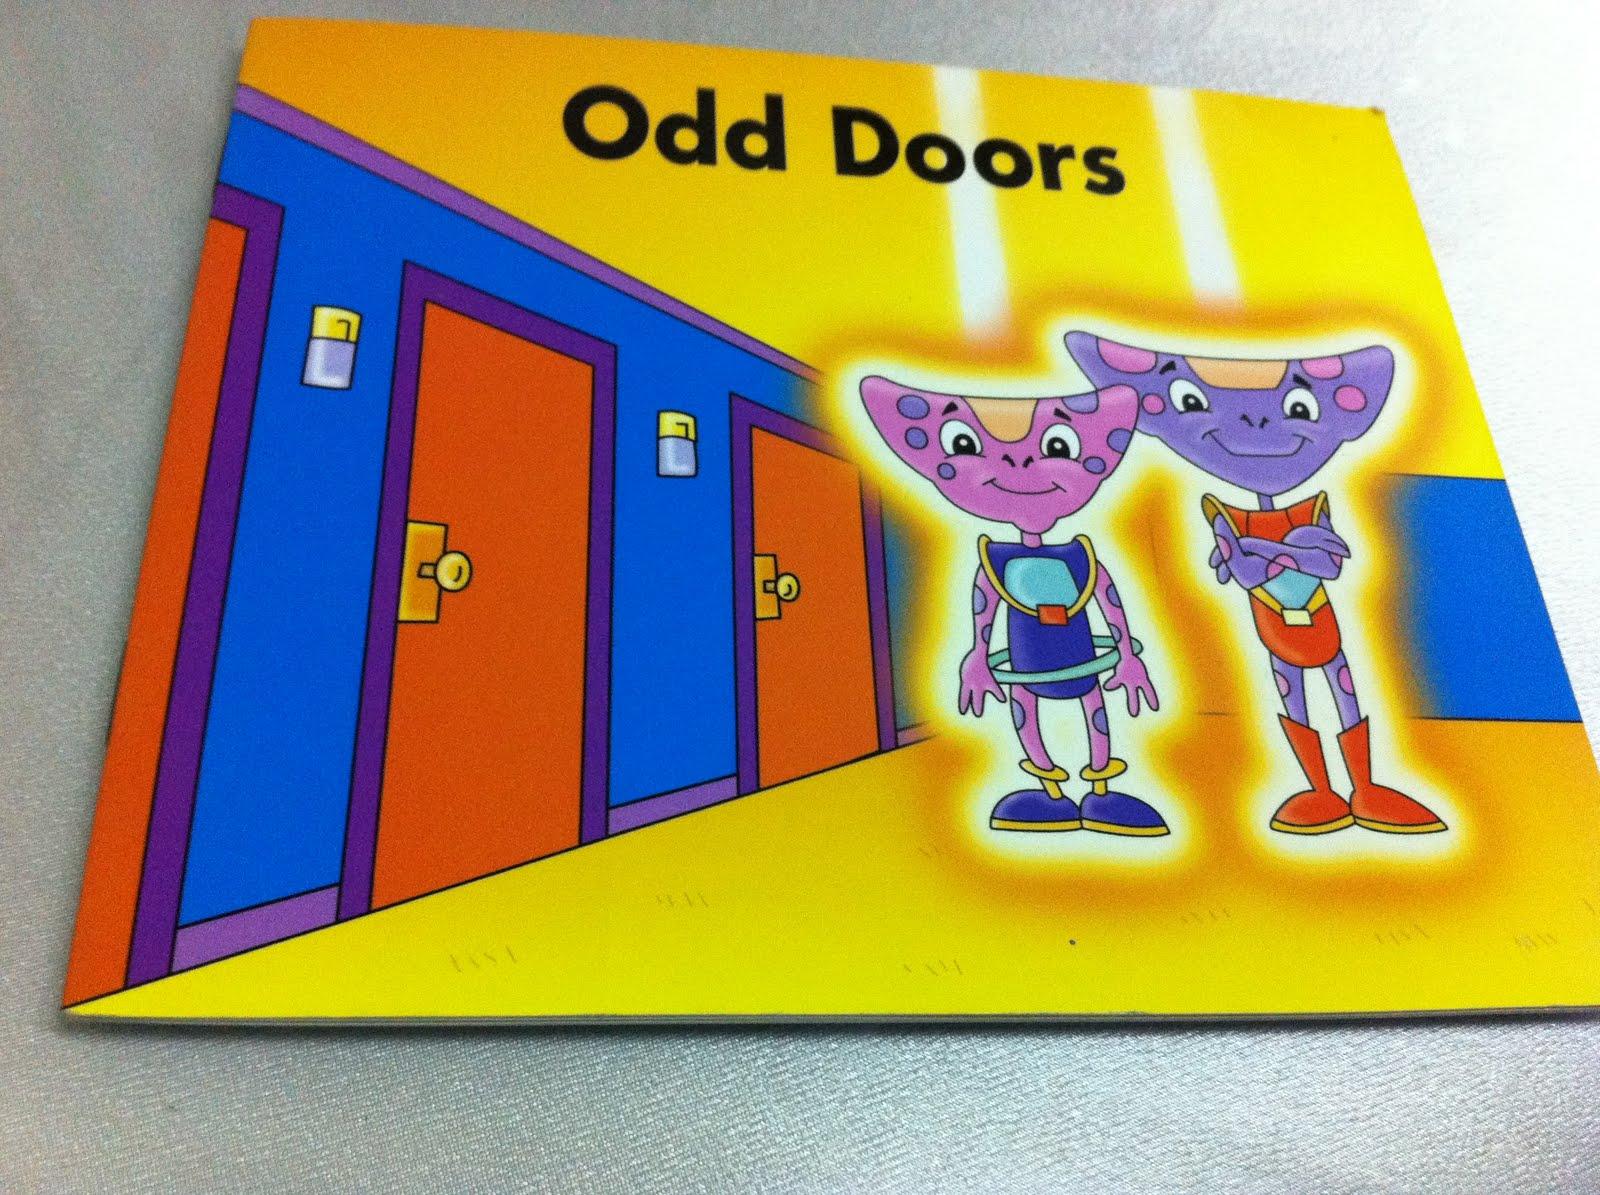 Wardrobe Eureka: Set 5: Galaxy Kids Maths (5 books) $12